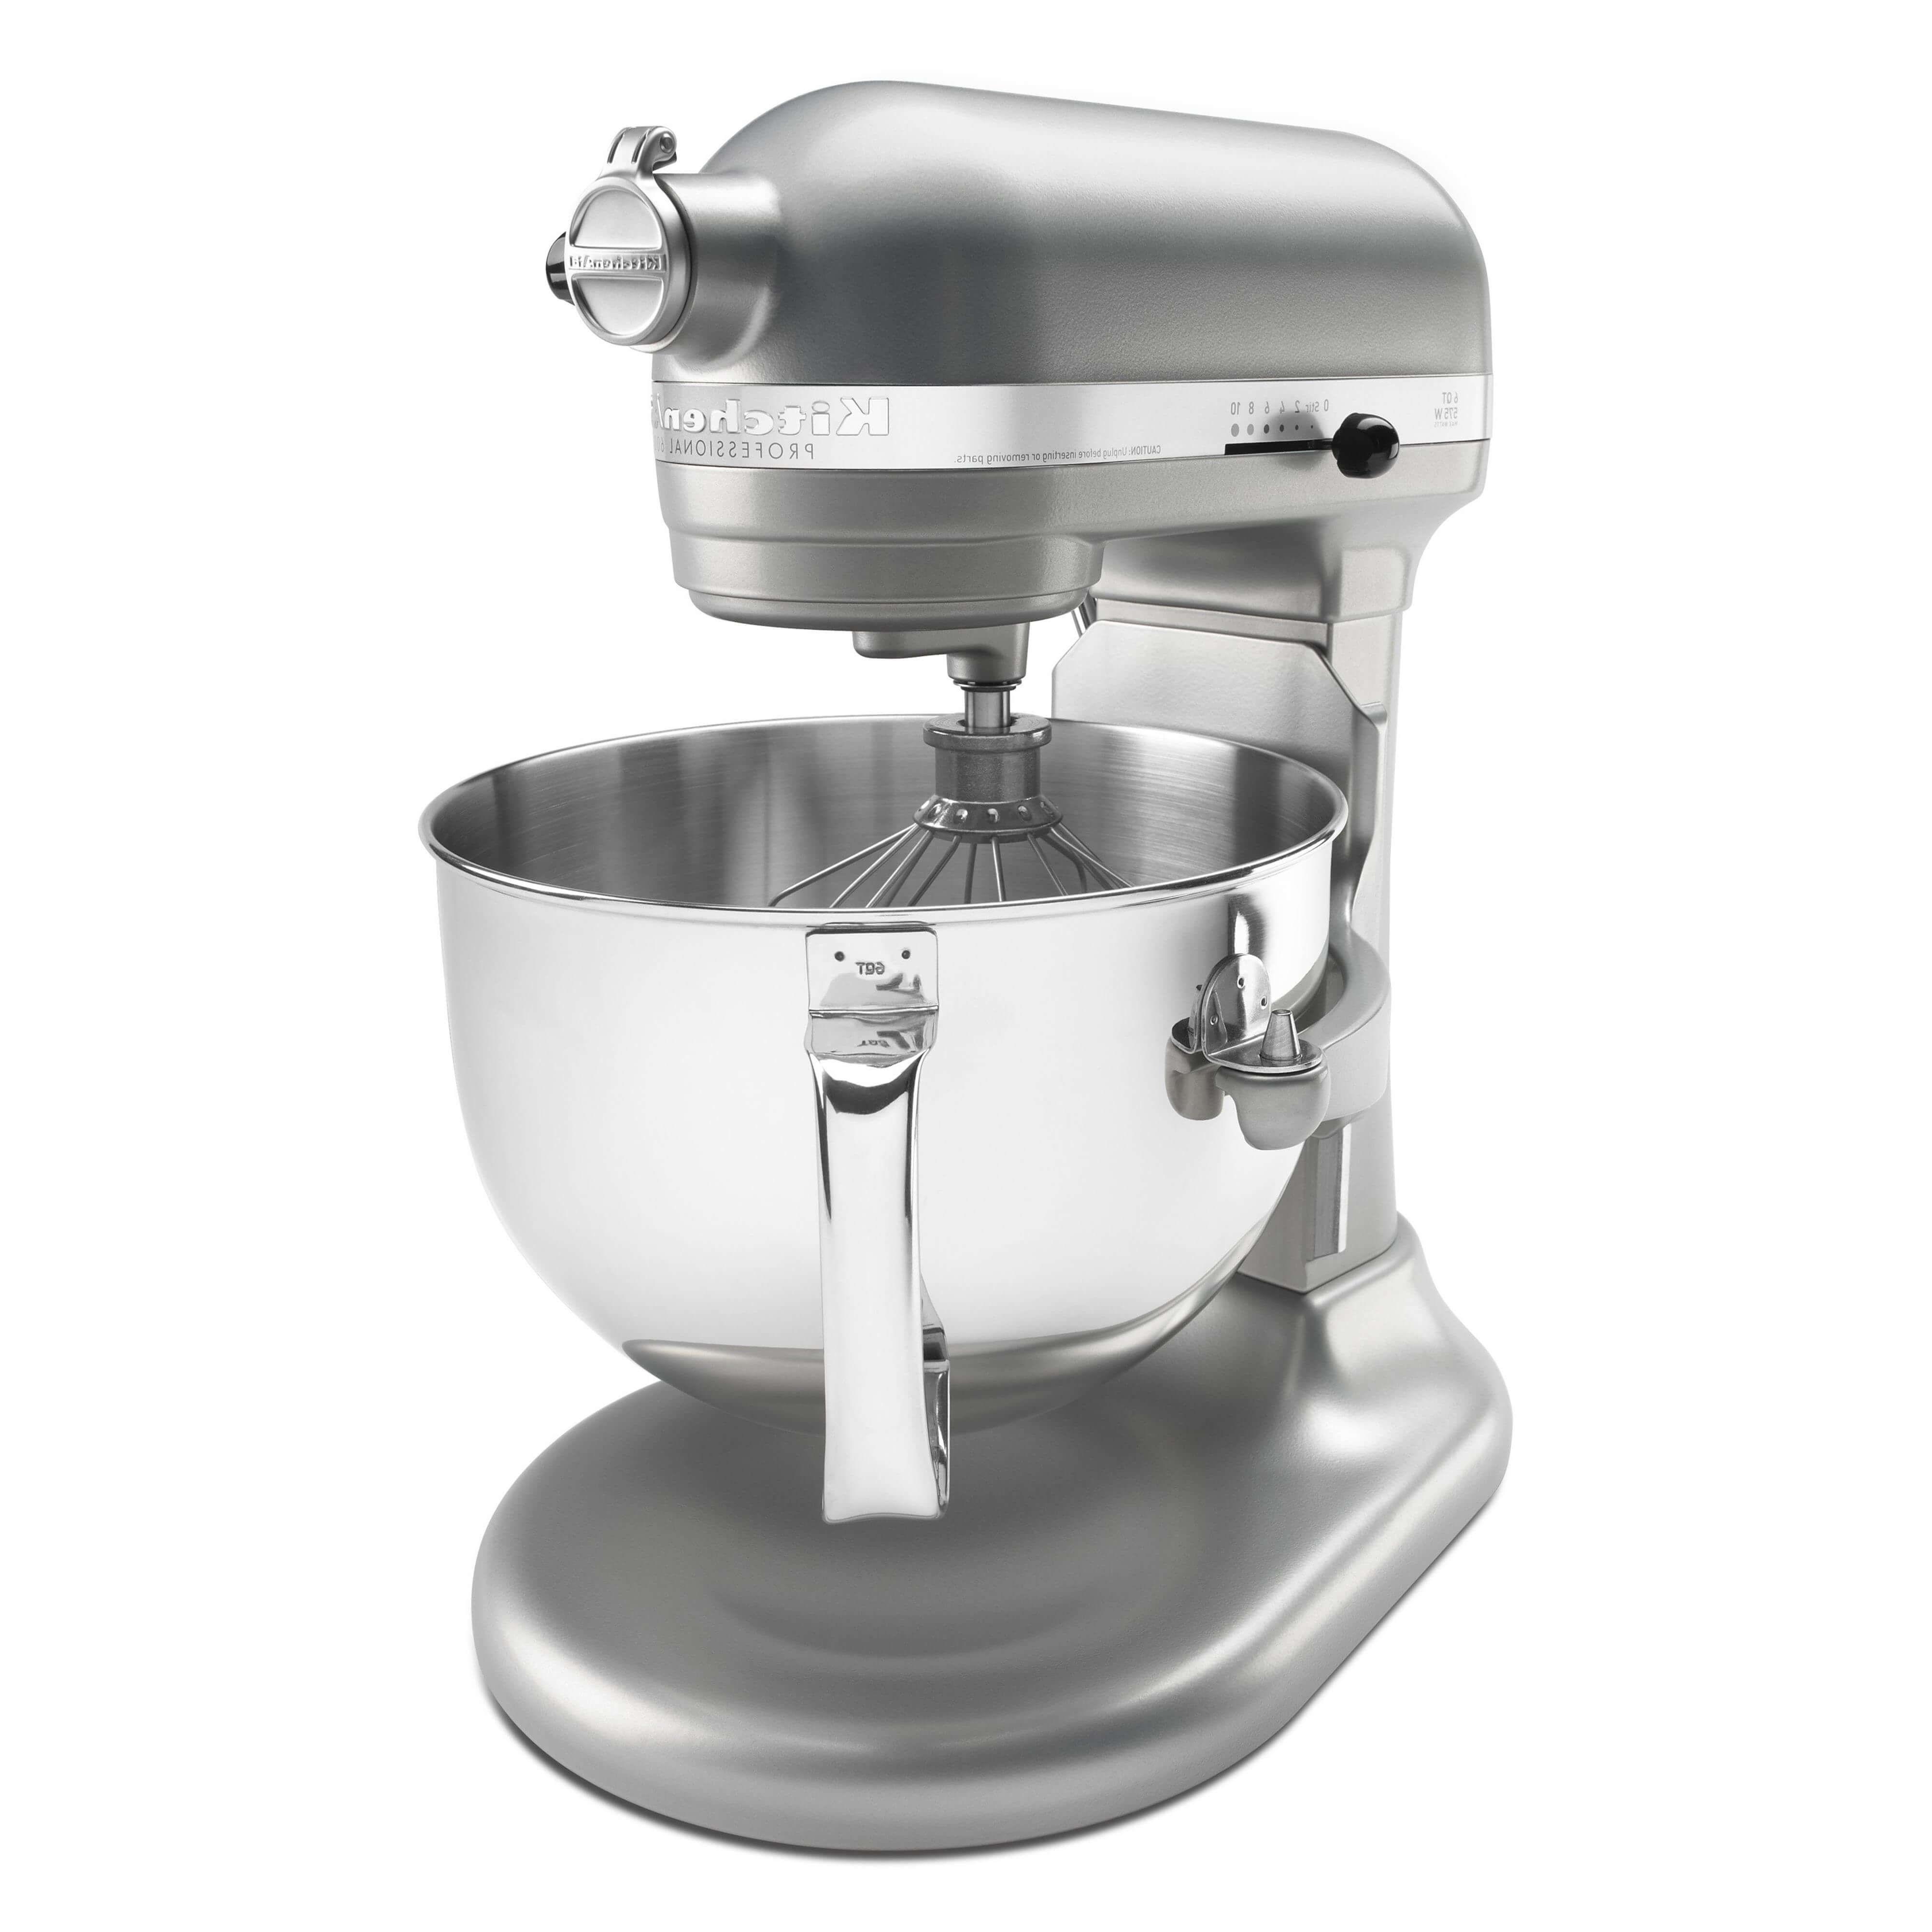 walmart kitchen aid mixer design jobs best stylish kitchenaid at 2017 12 35 home ideas